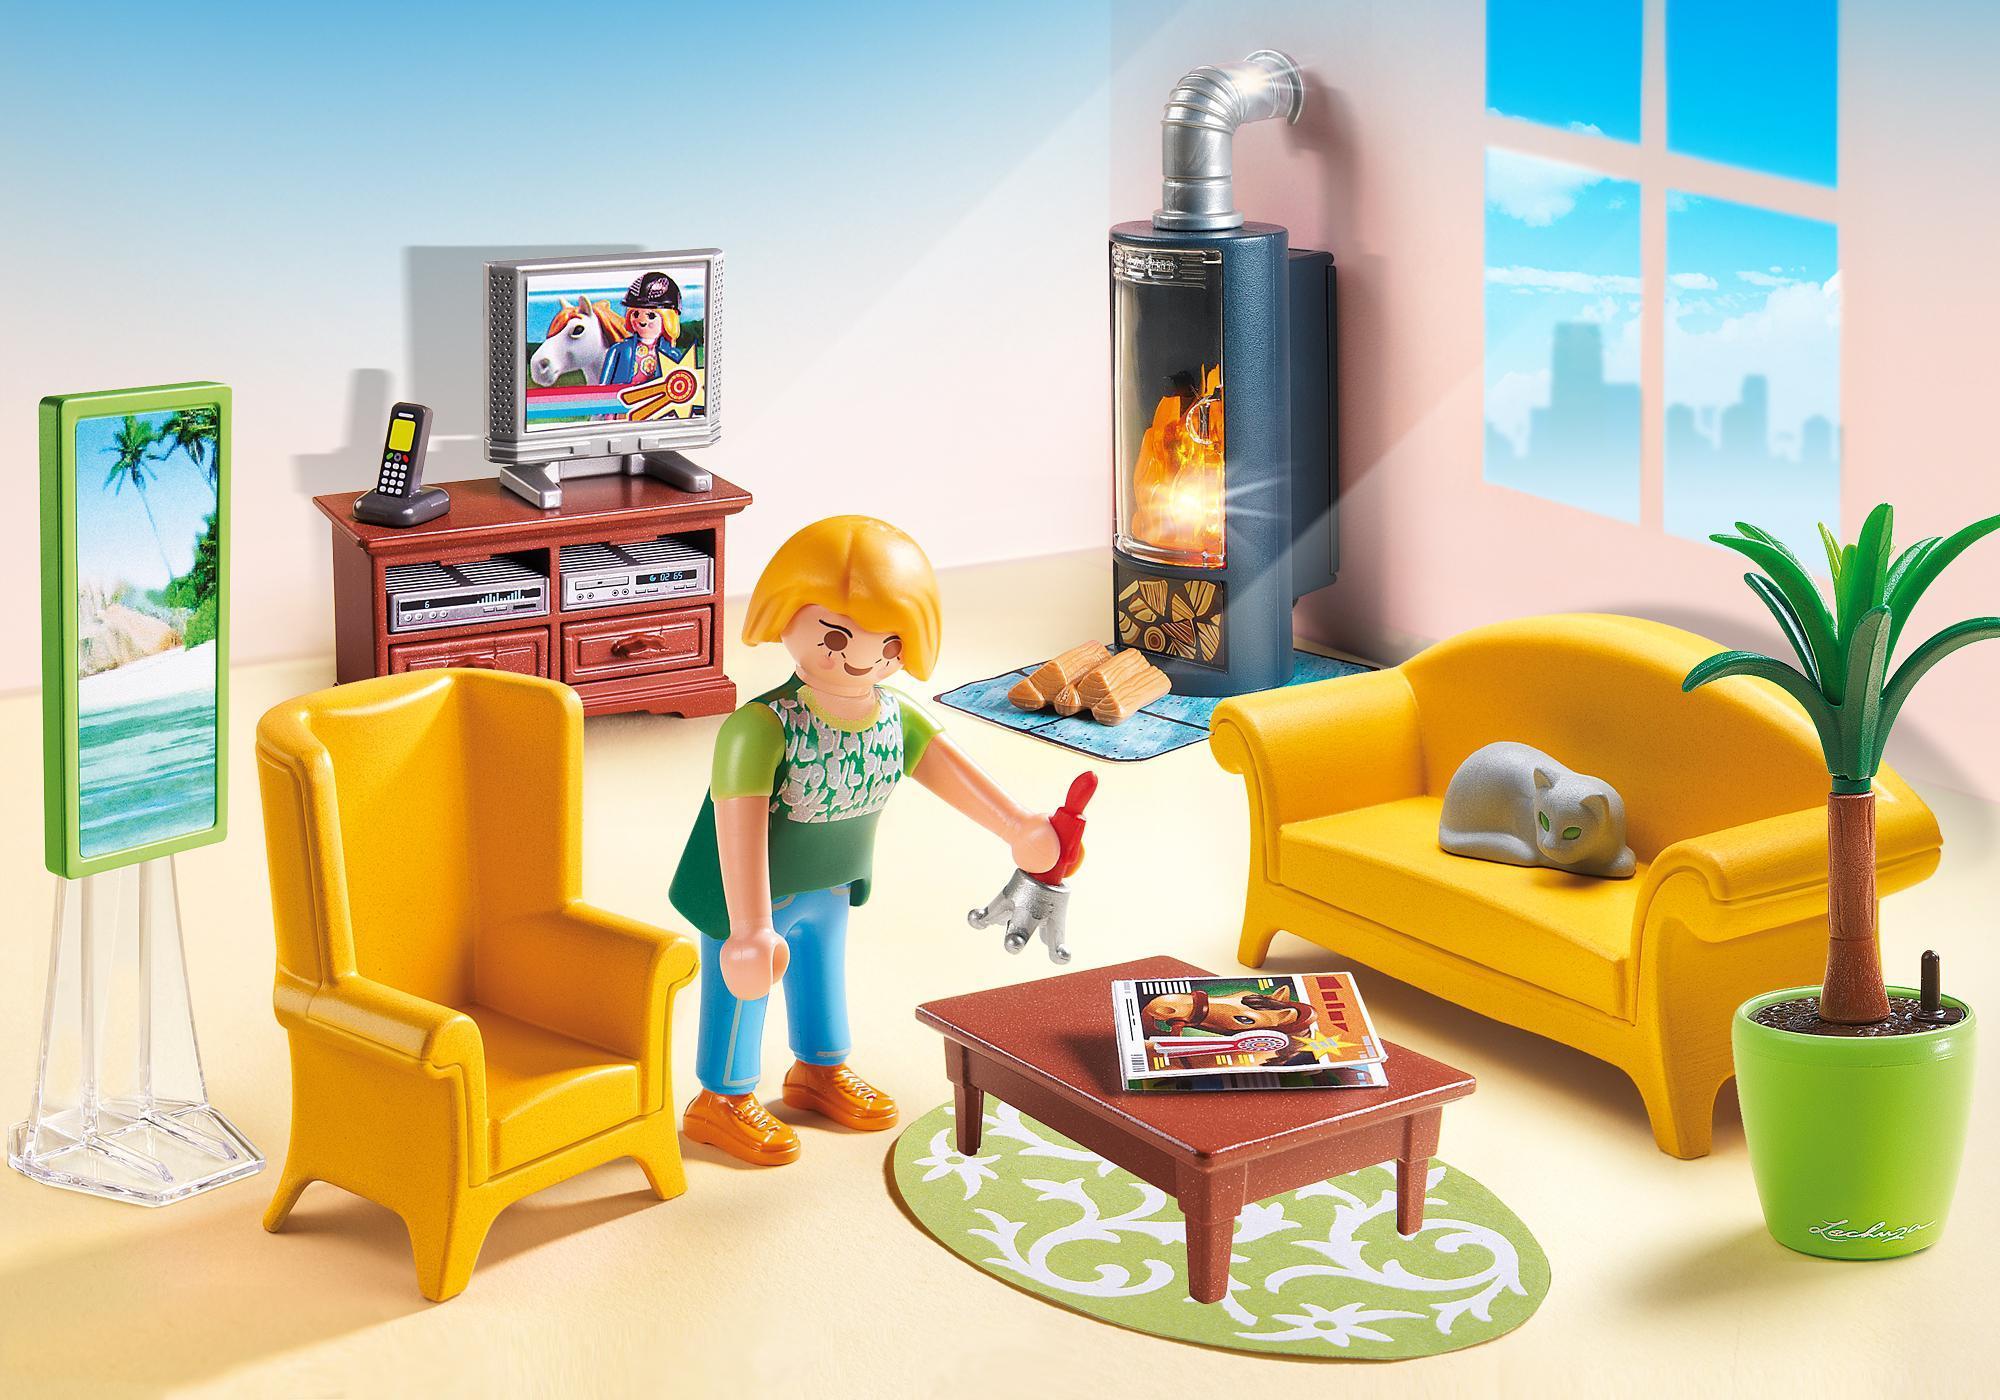 http://media.playmobil.com/i/playmobil/5308_product_detail/Wohnzimmer mit Kaminofen